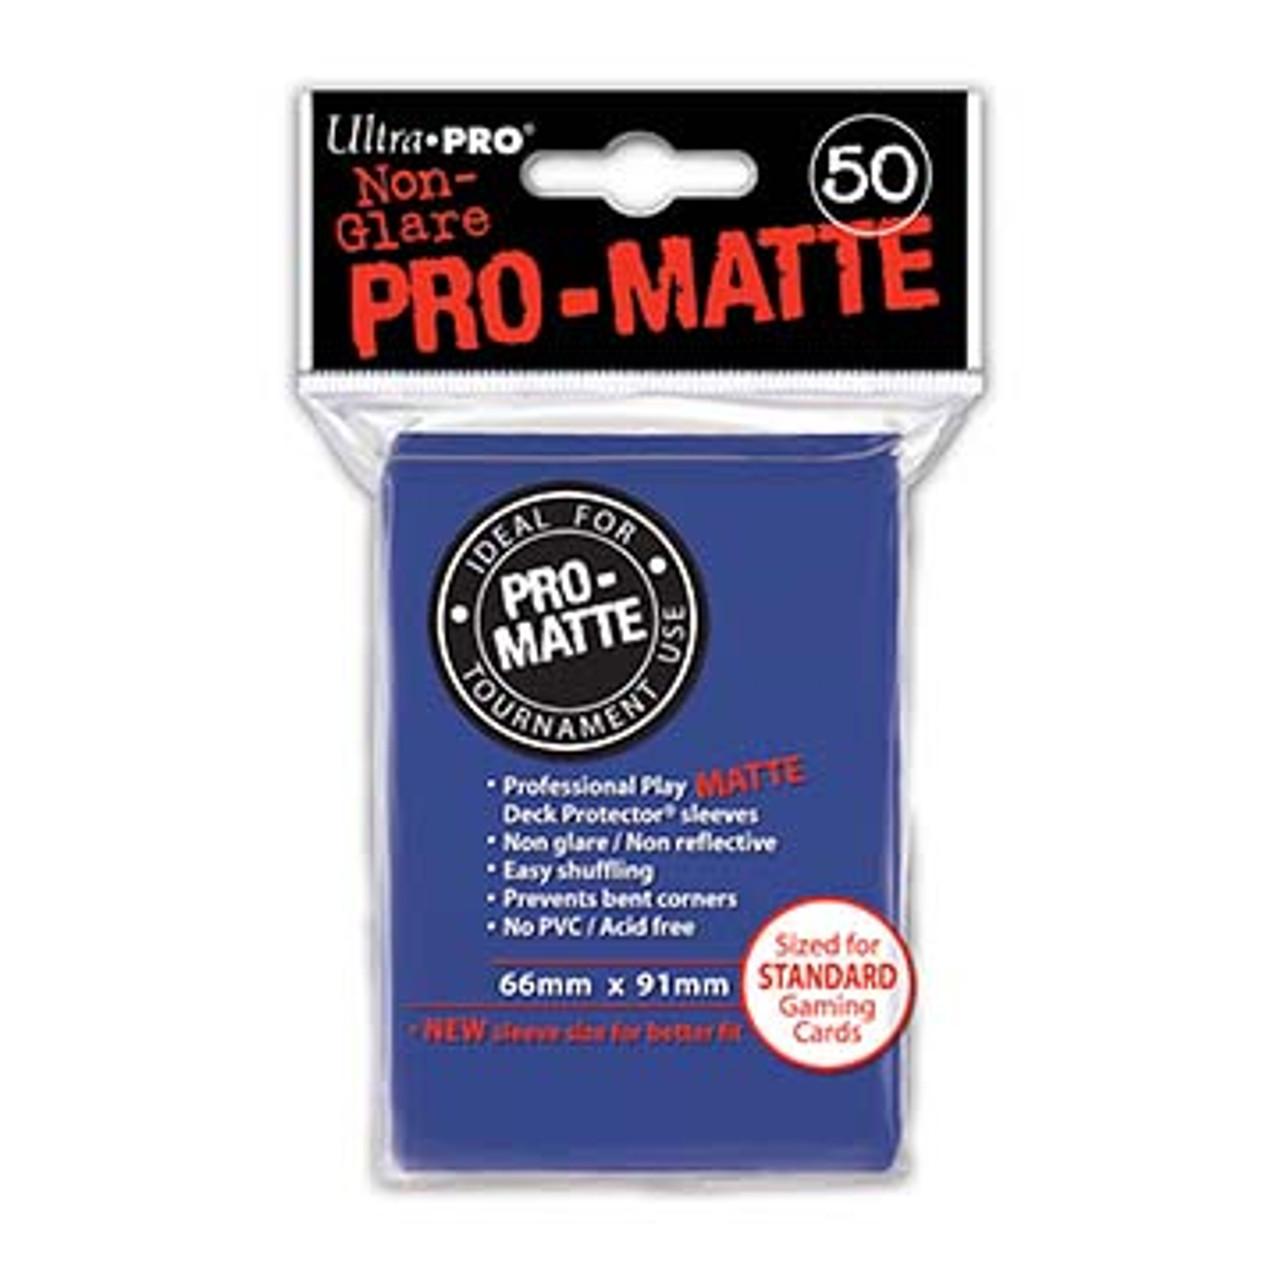 Deck Protectors - Pro-Matte - Blue (One Pack of 50)